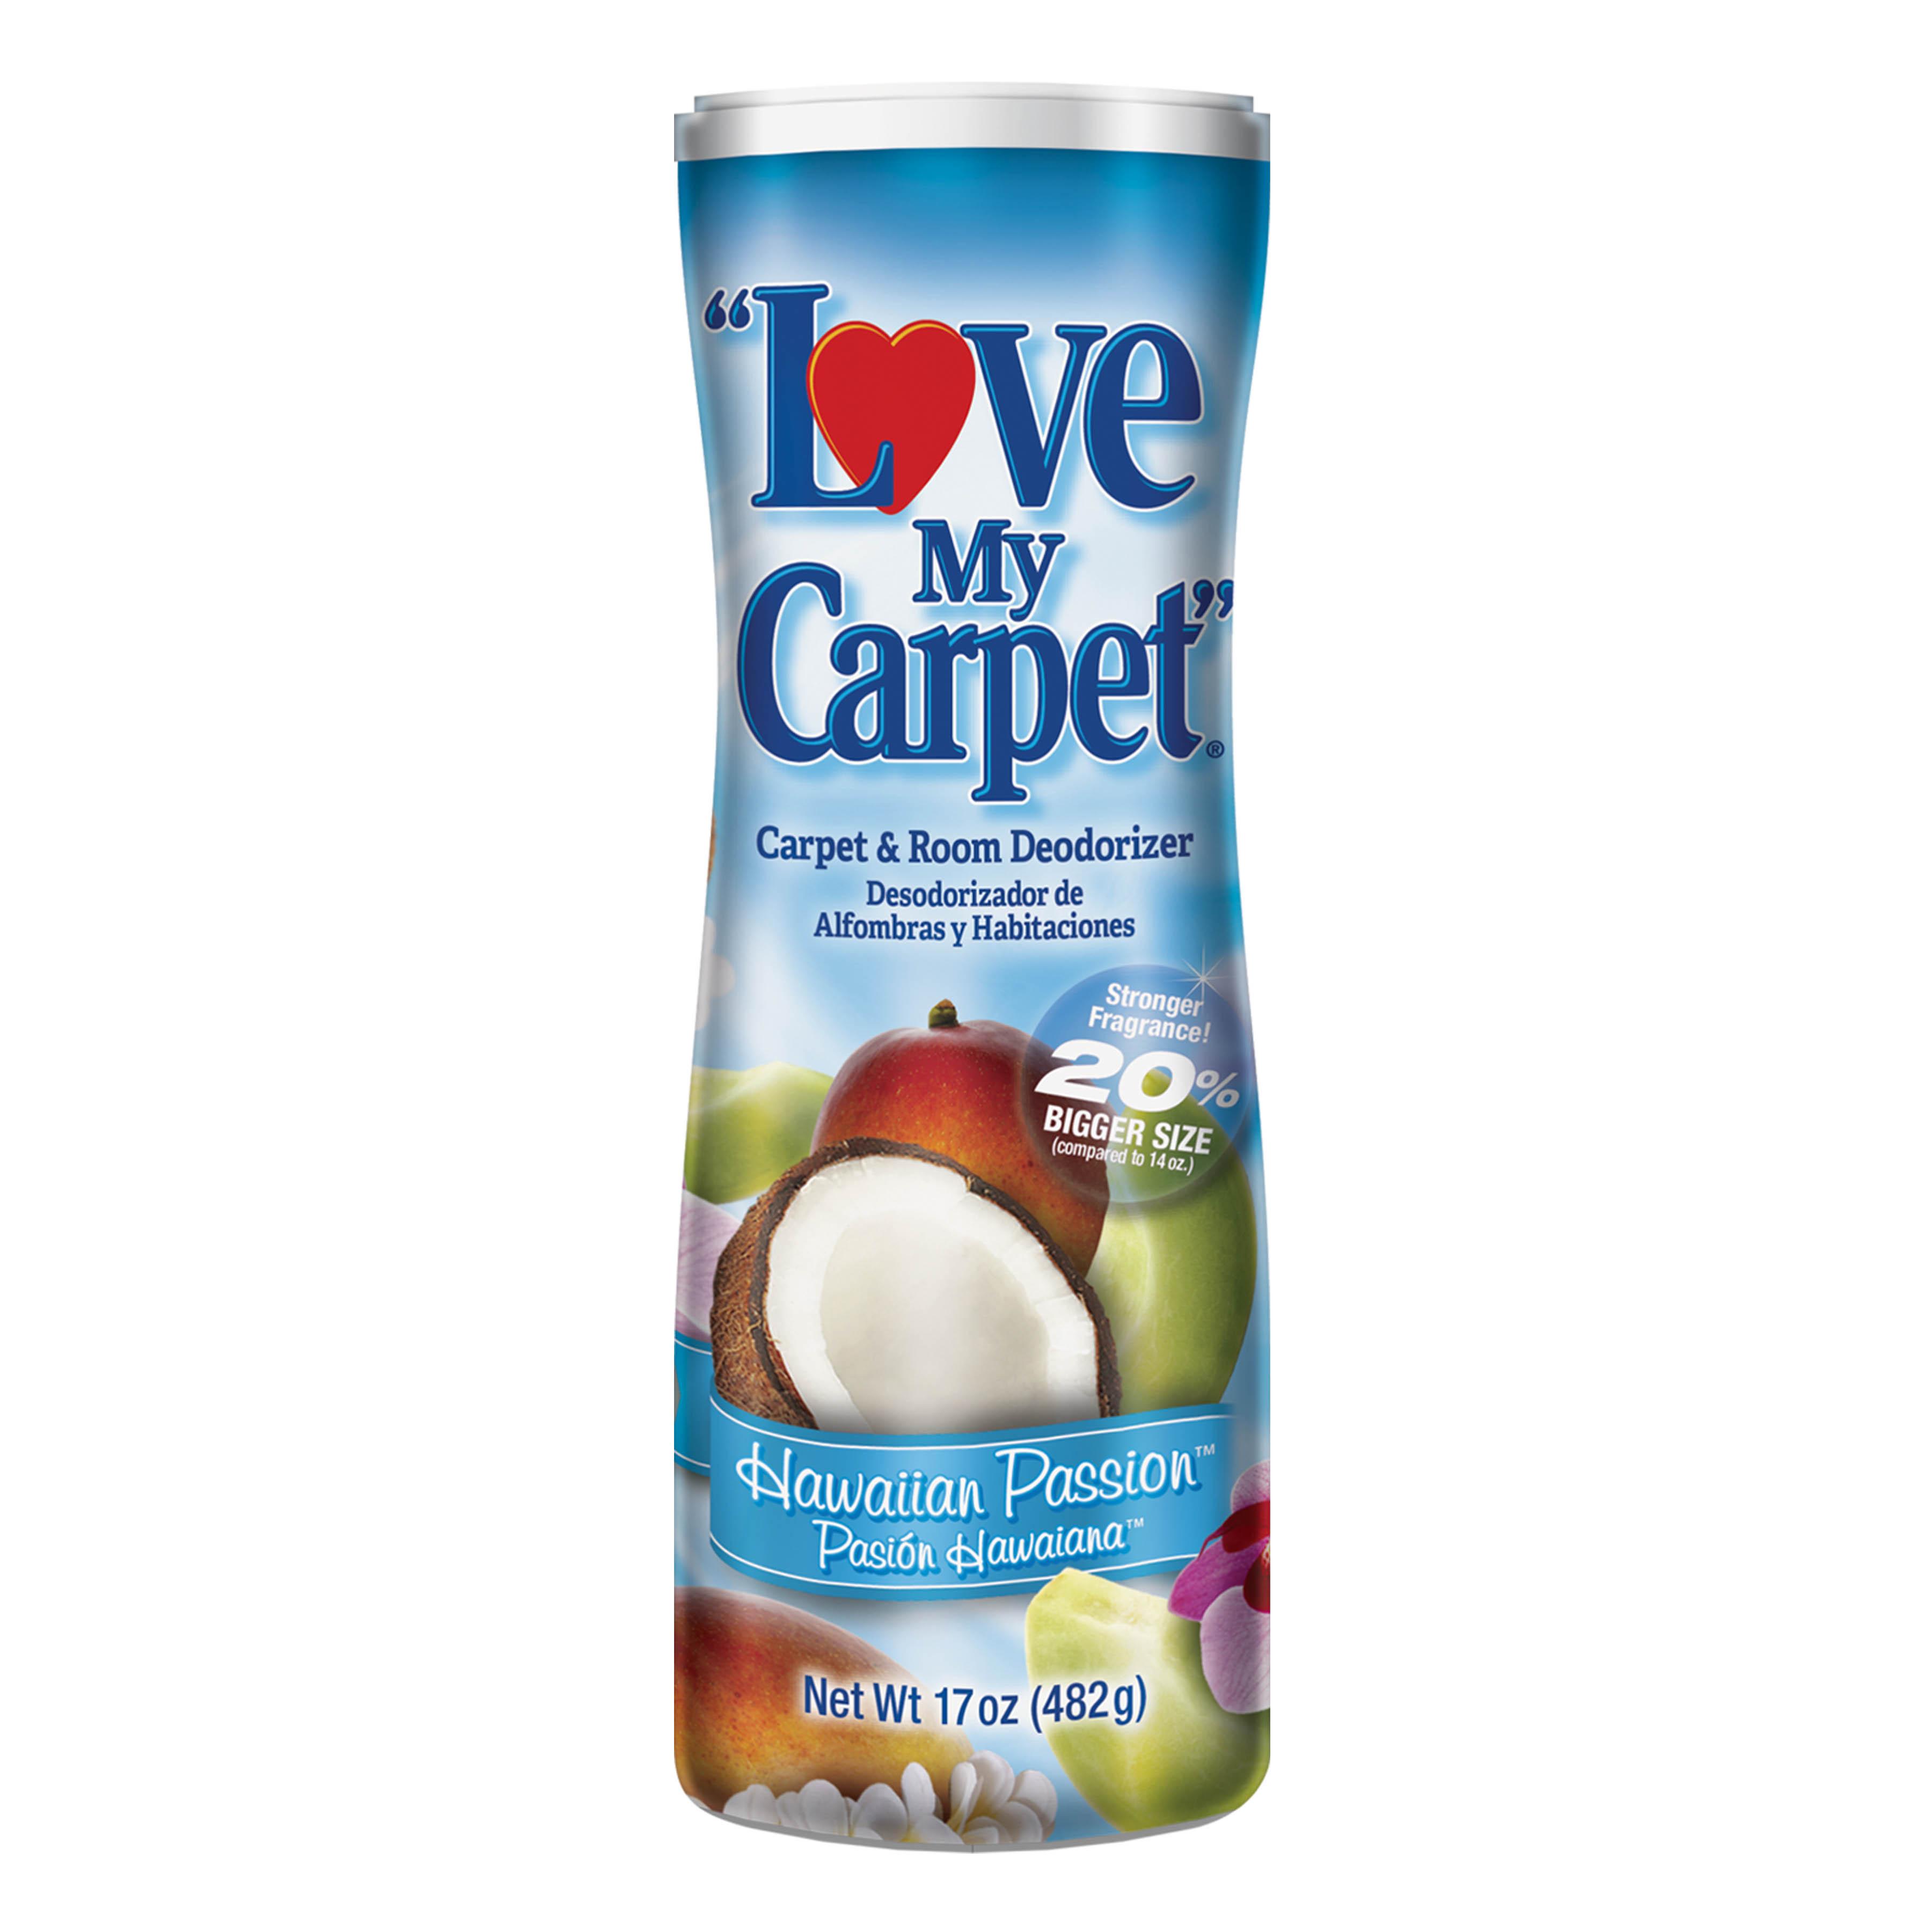 Love My Carpet, Hawaiian Passion